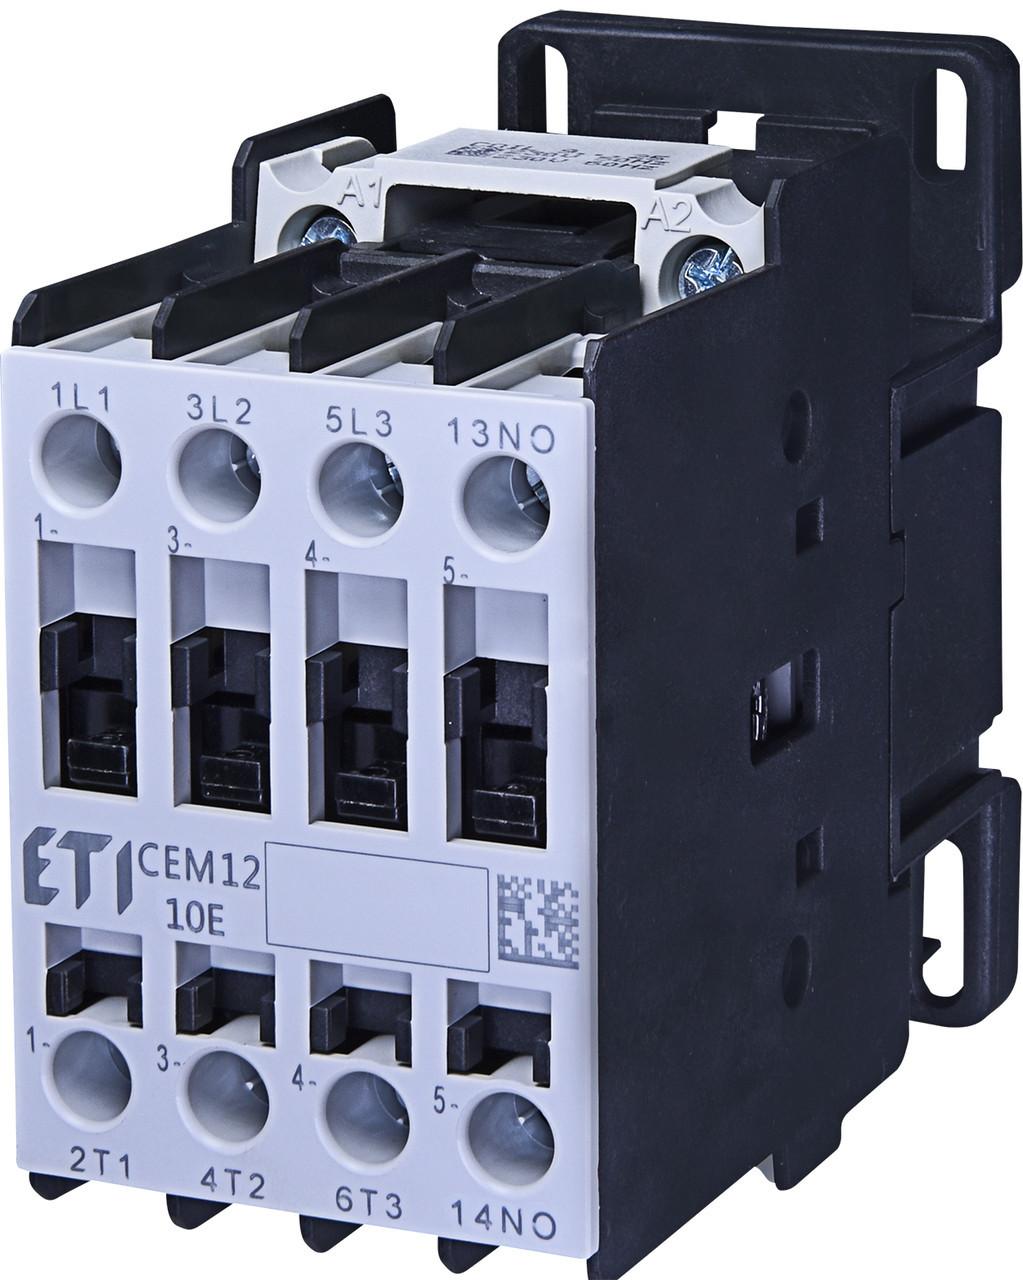 Контактор силовой ETI CEM 12.10 12А 230V AC 3NO+1NO 5.5kW 4643123 (на DIN-рейку, 25A AC1, 12A AC3)